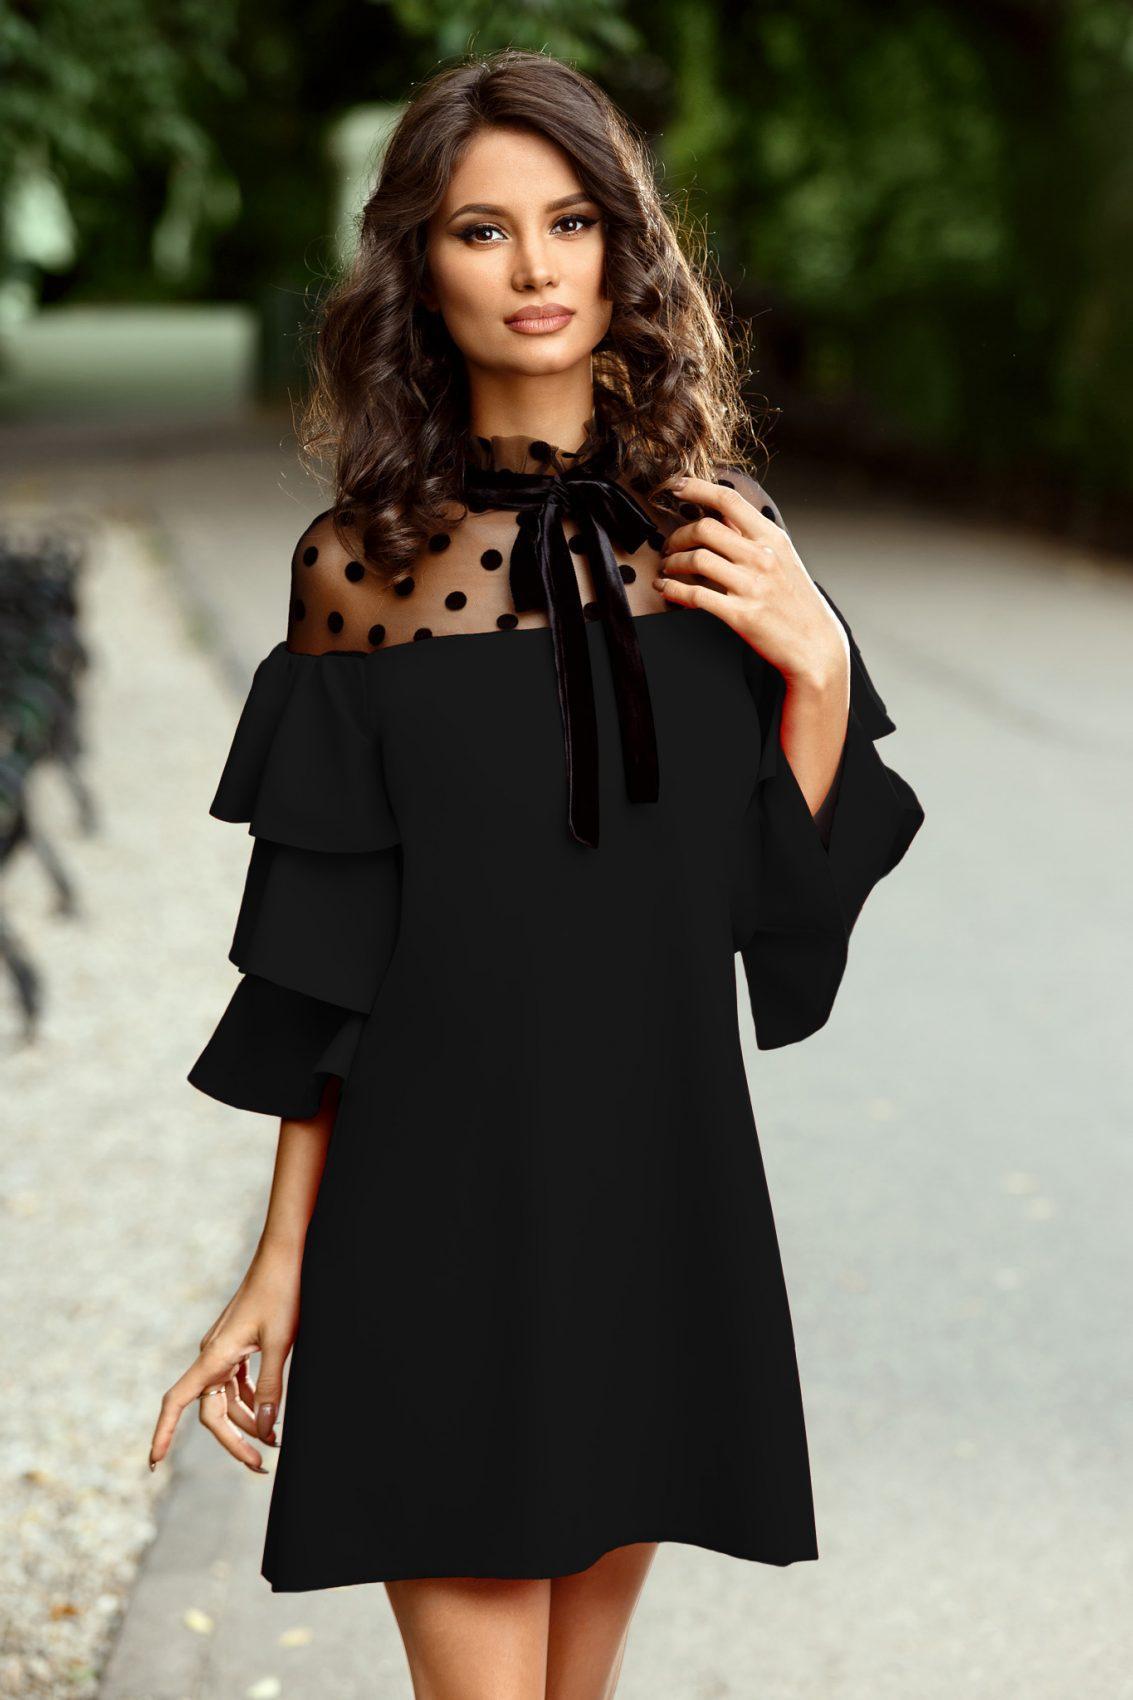 Valerie Black Dress